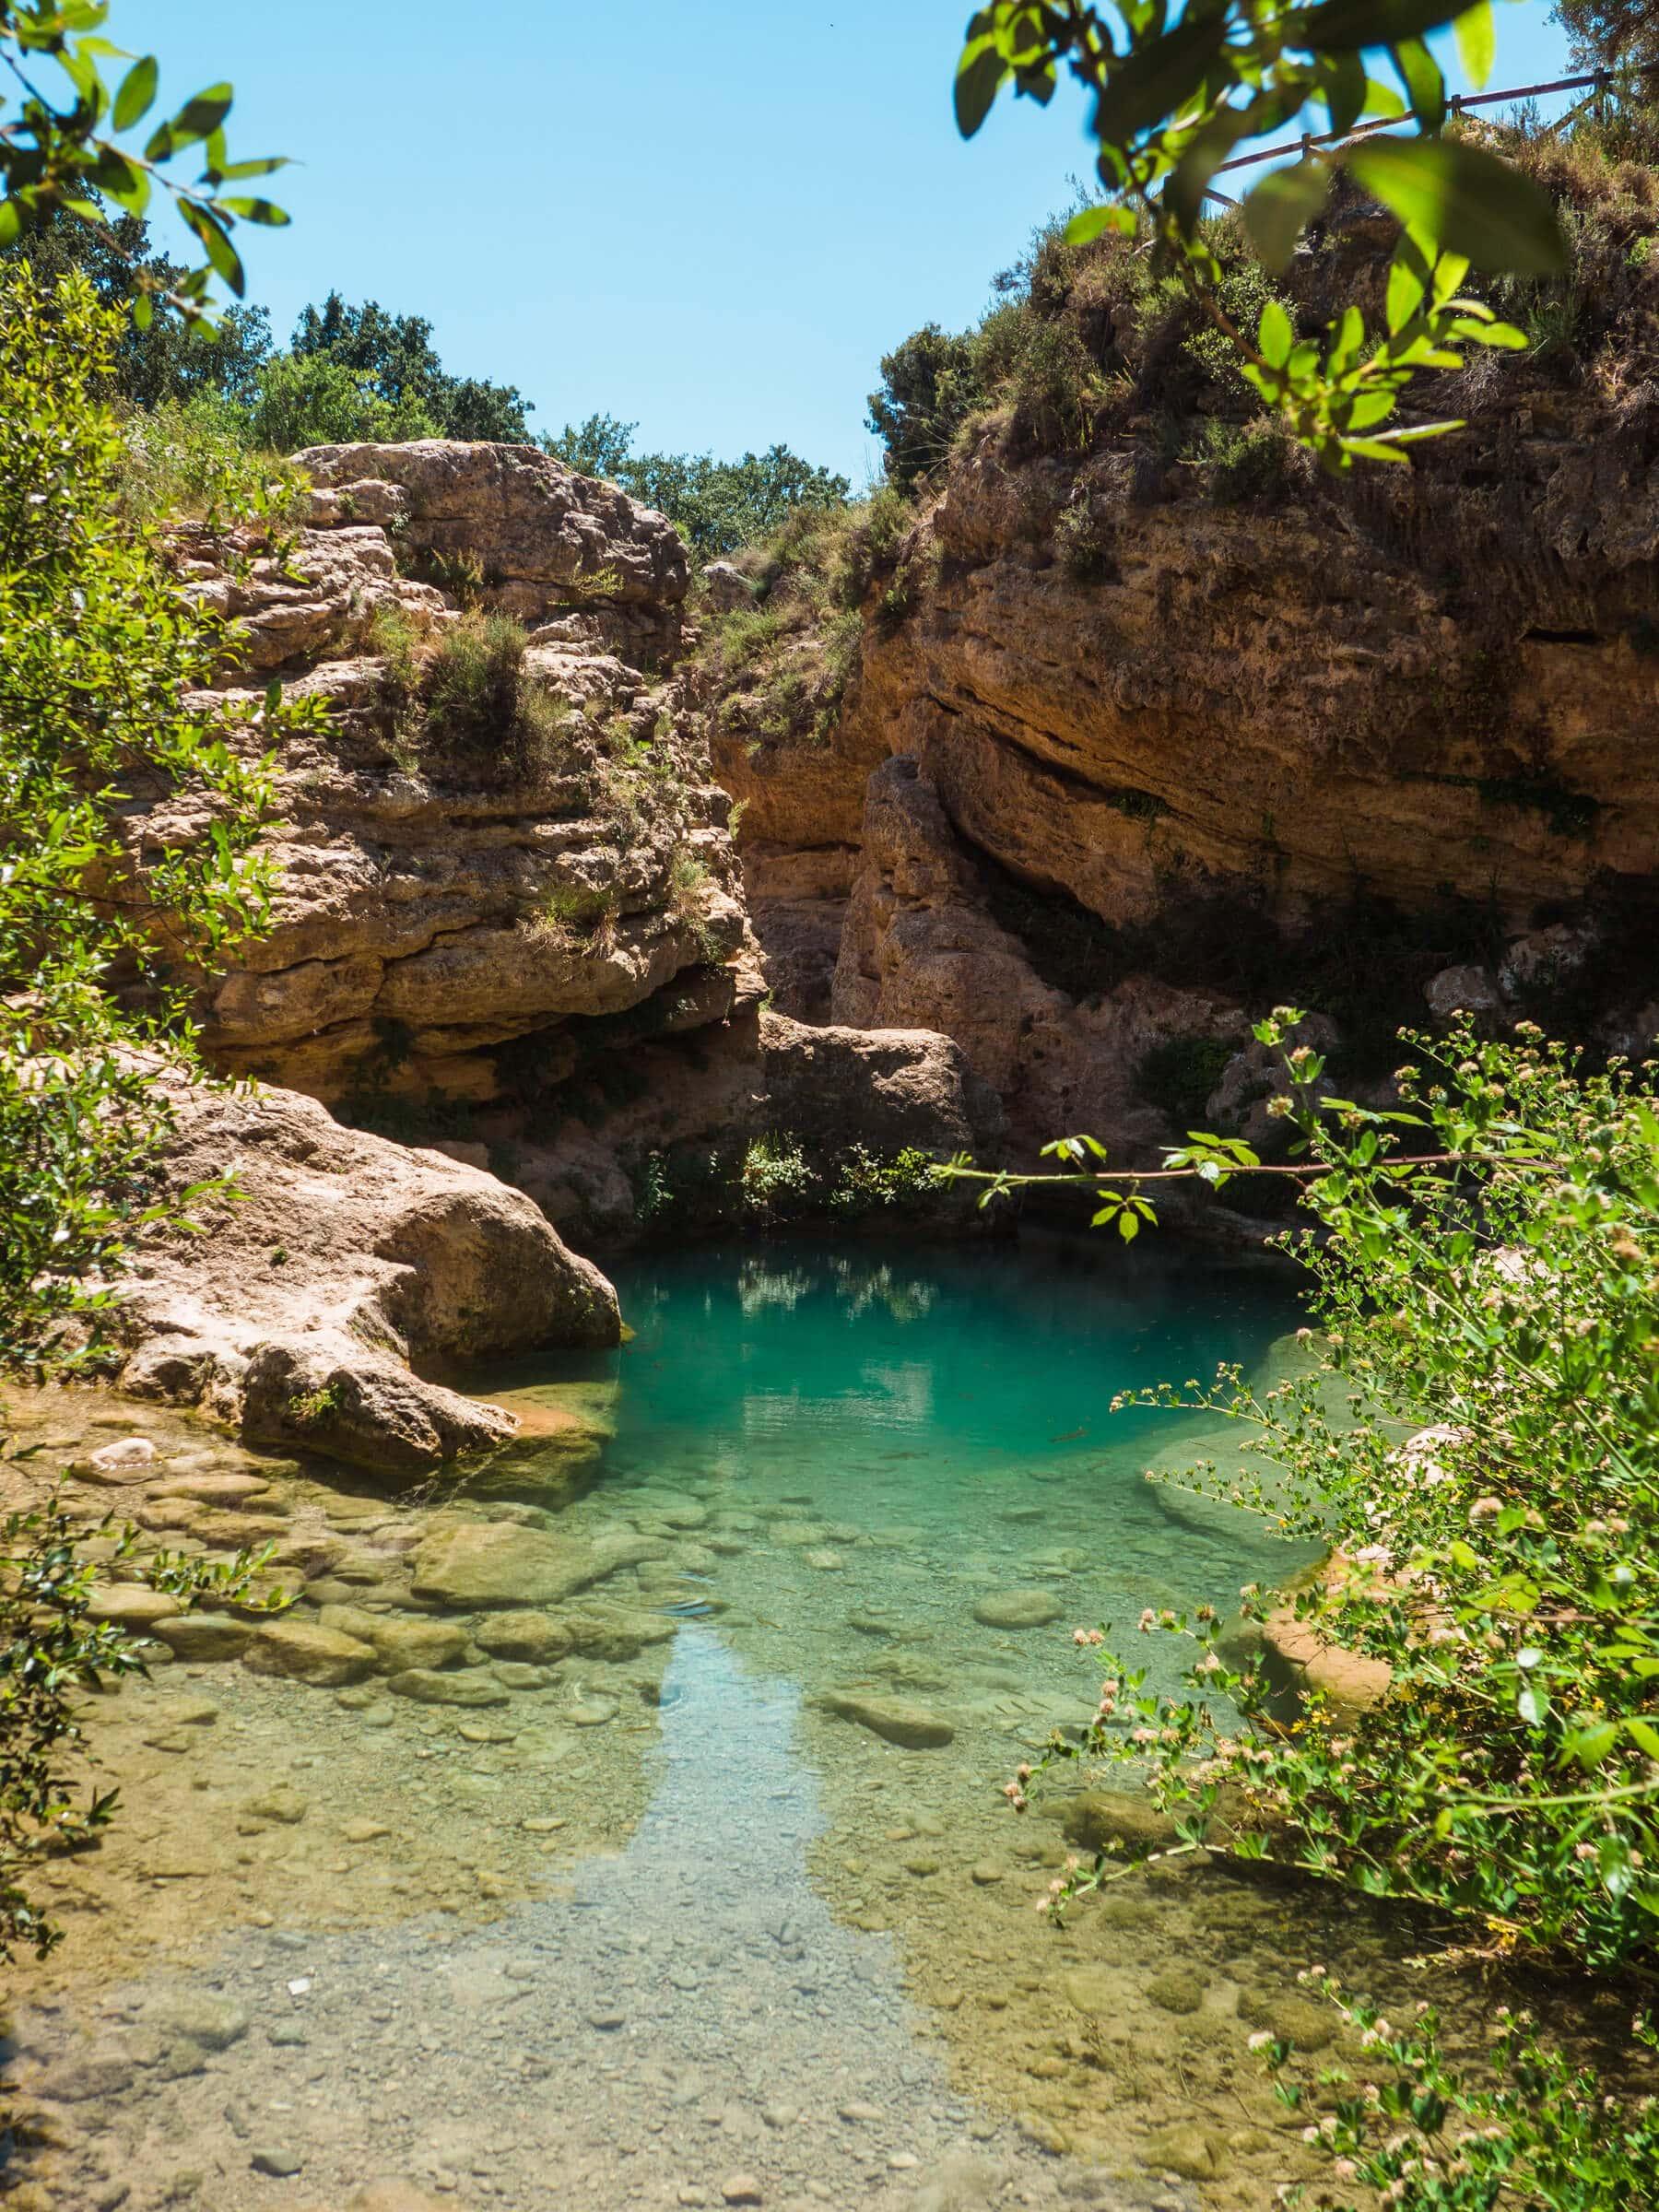 Murcia, Spain: Top 14 awesome things to do - Salto del Usero Bullas waterfall